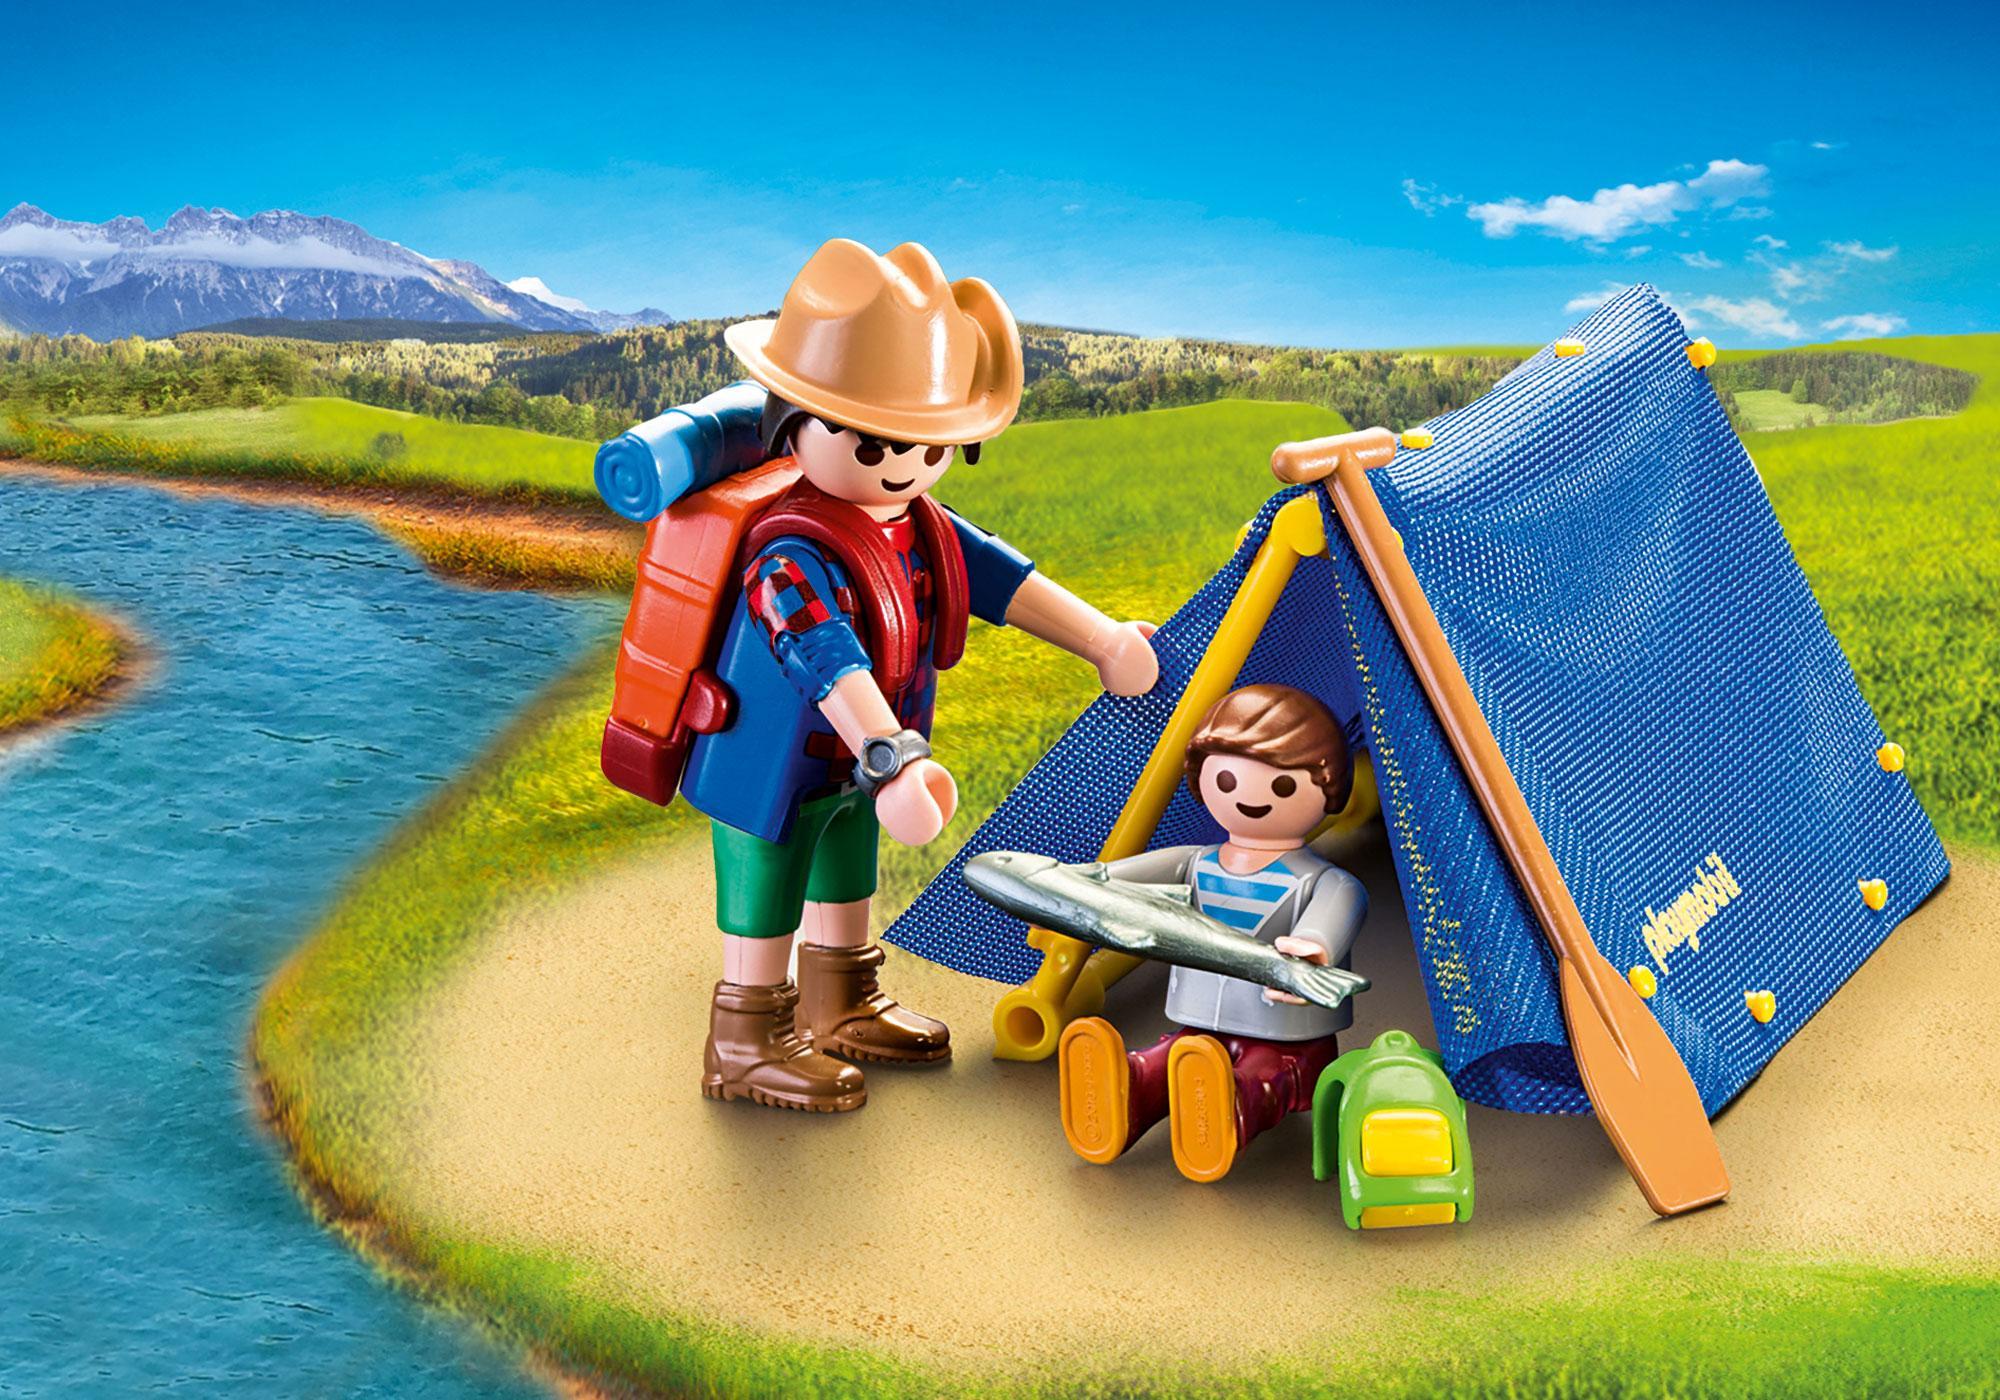 http://media.playmobil.com/i/playmobil/9323_product_extra1